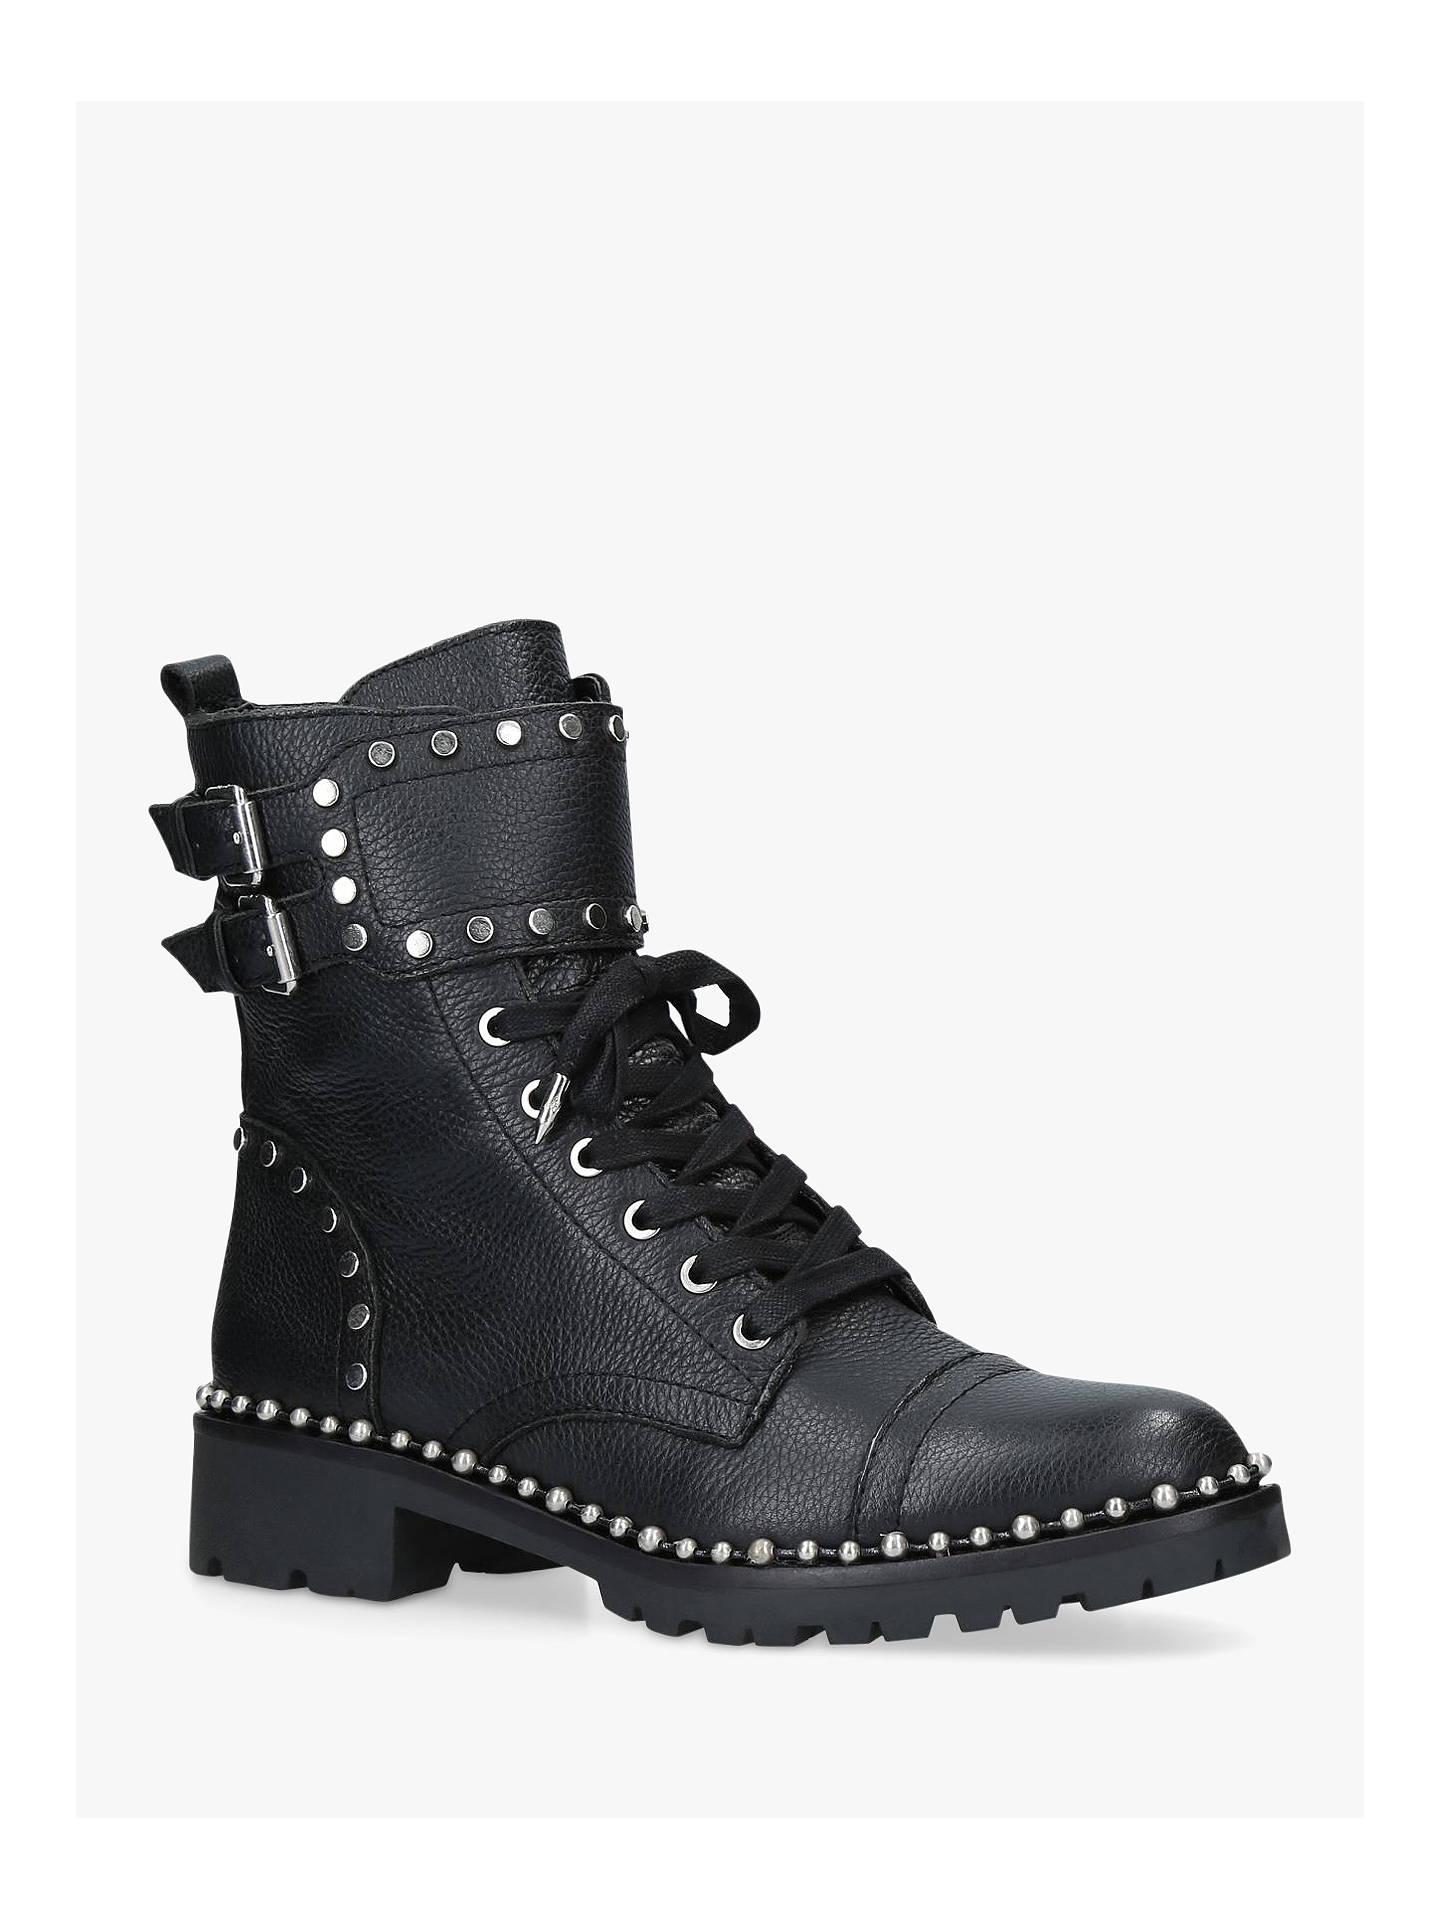 371b8e205 ... Buy Sam Edelman Jennifer Stud Lace Up Boots